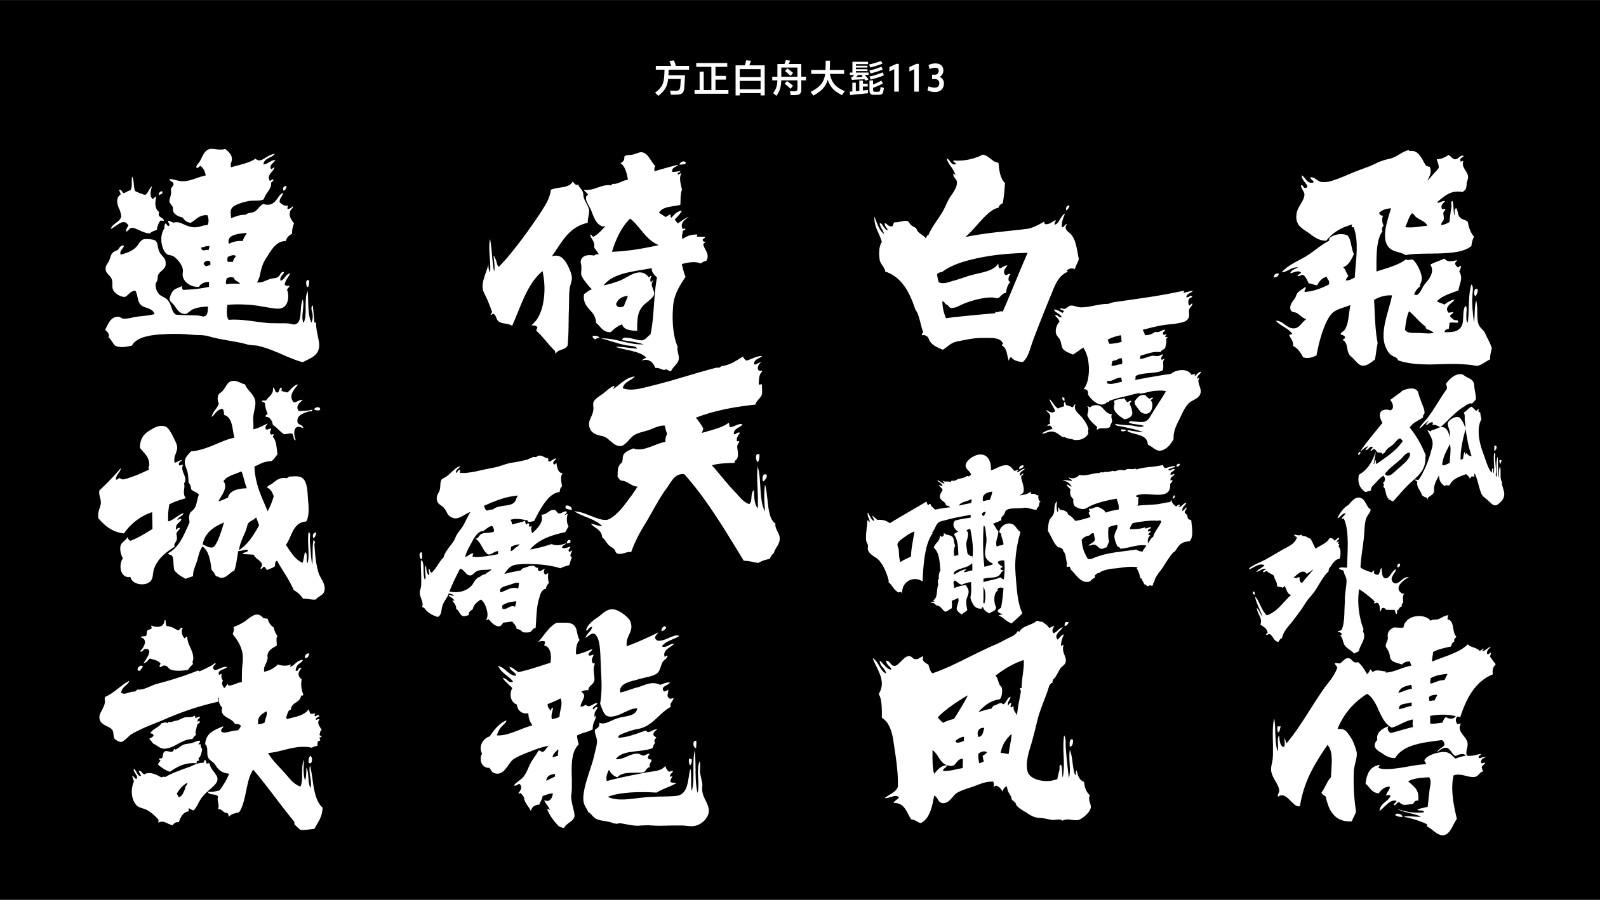 https://ft-bk1.oss-cn-zhangjiakou.aliyuncs.com/Public/Uploads/img/n_content_20201210180158_7452.jpg